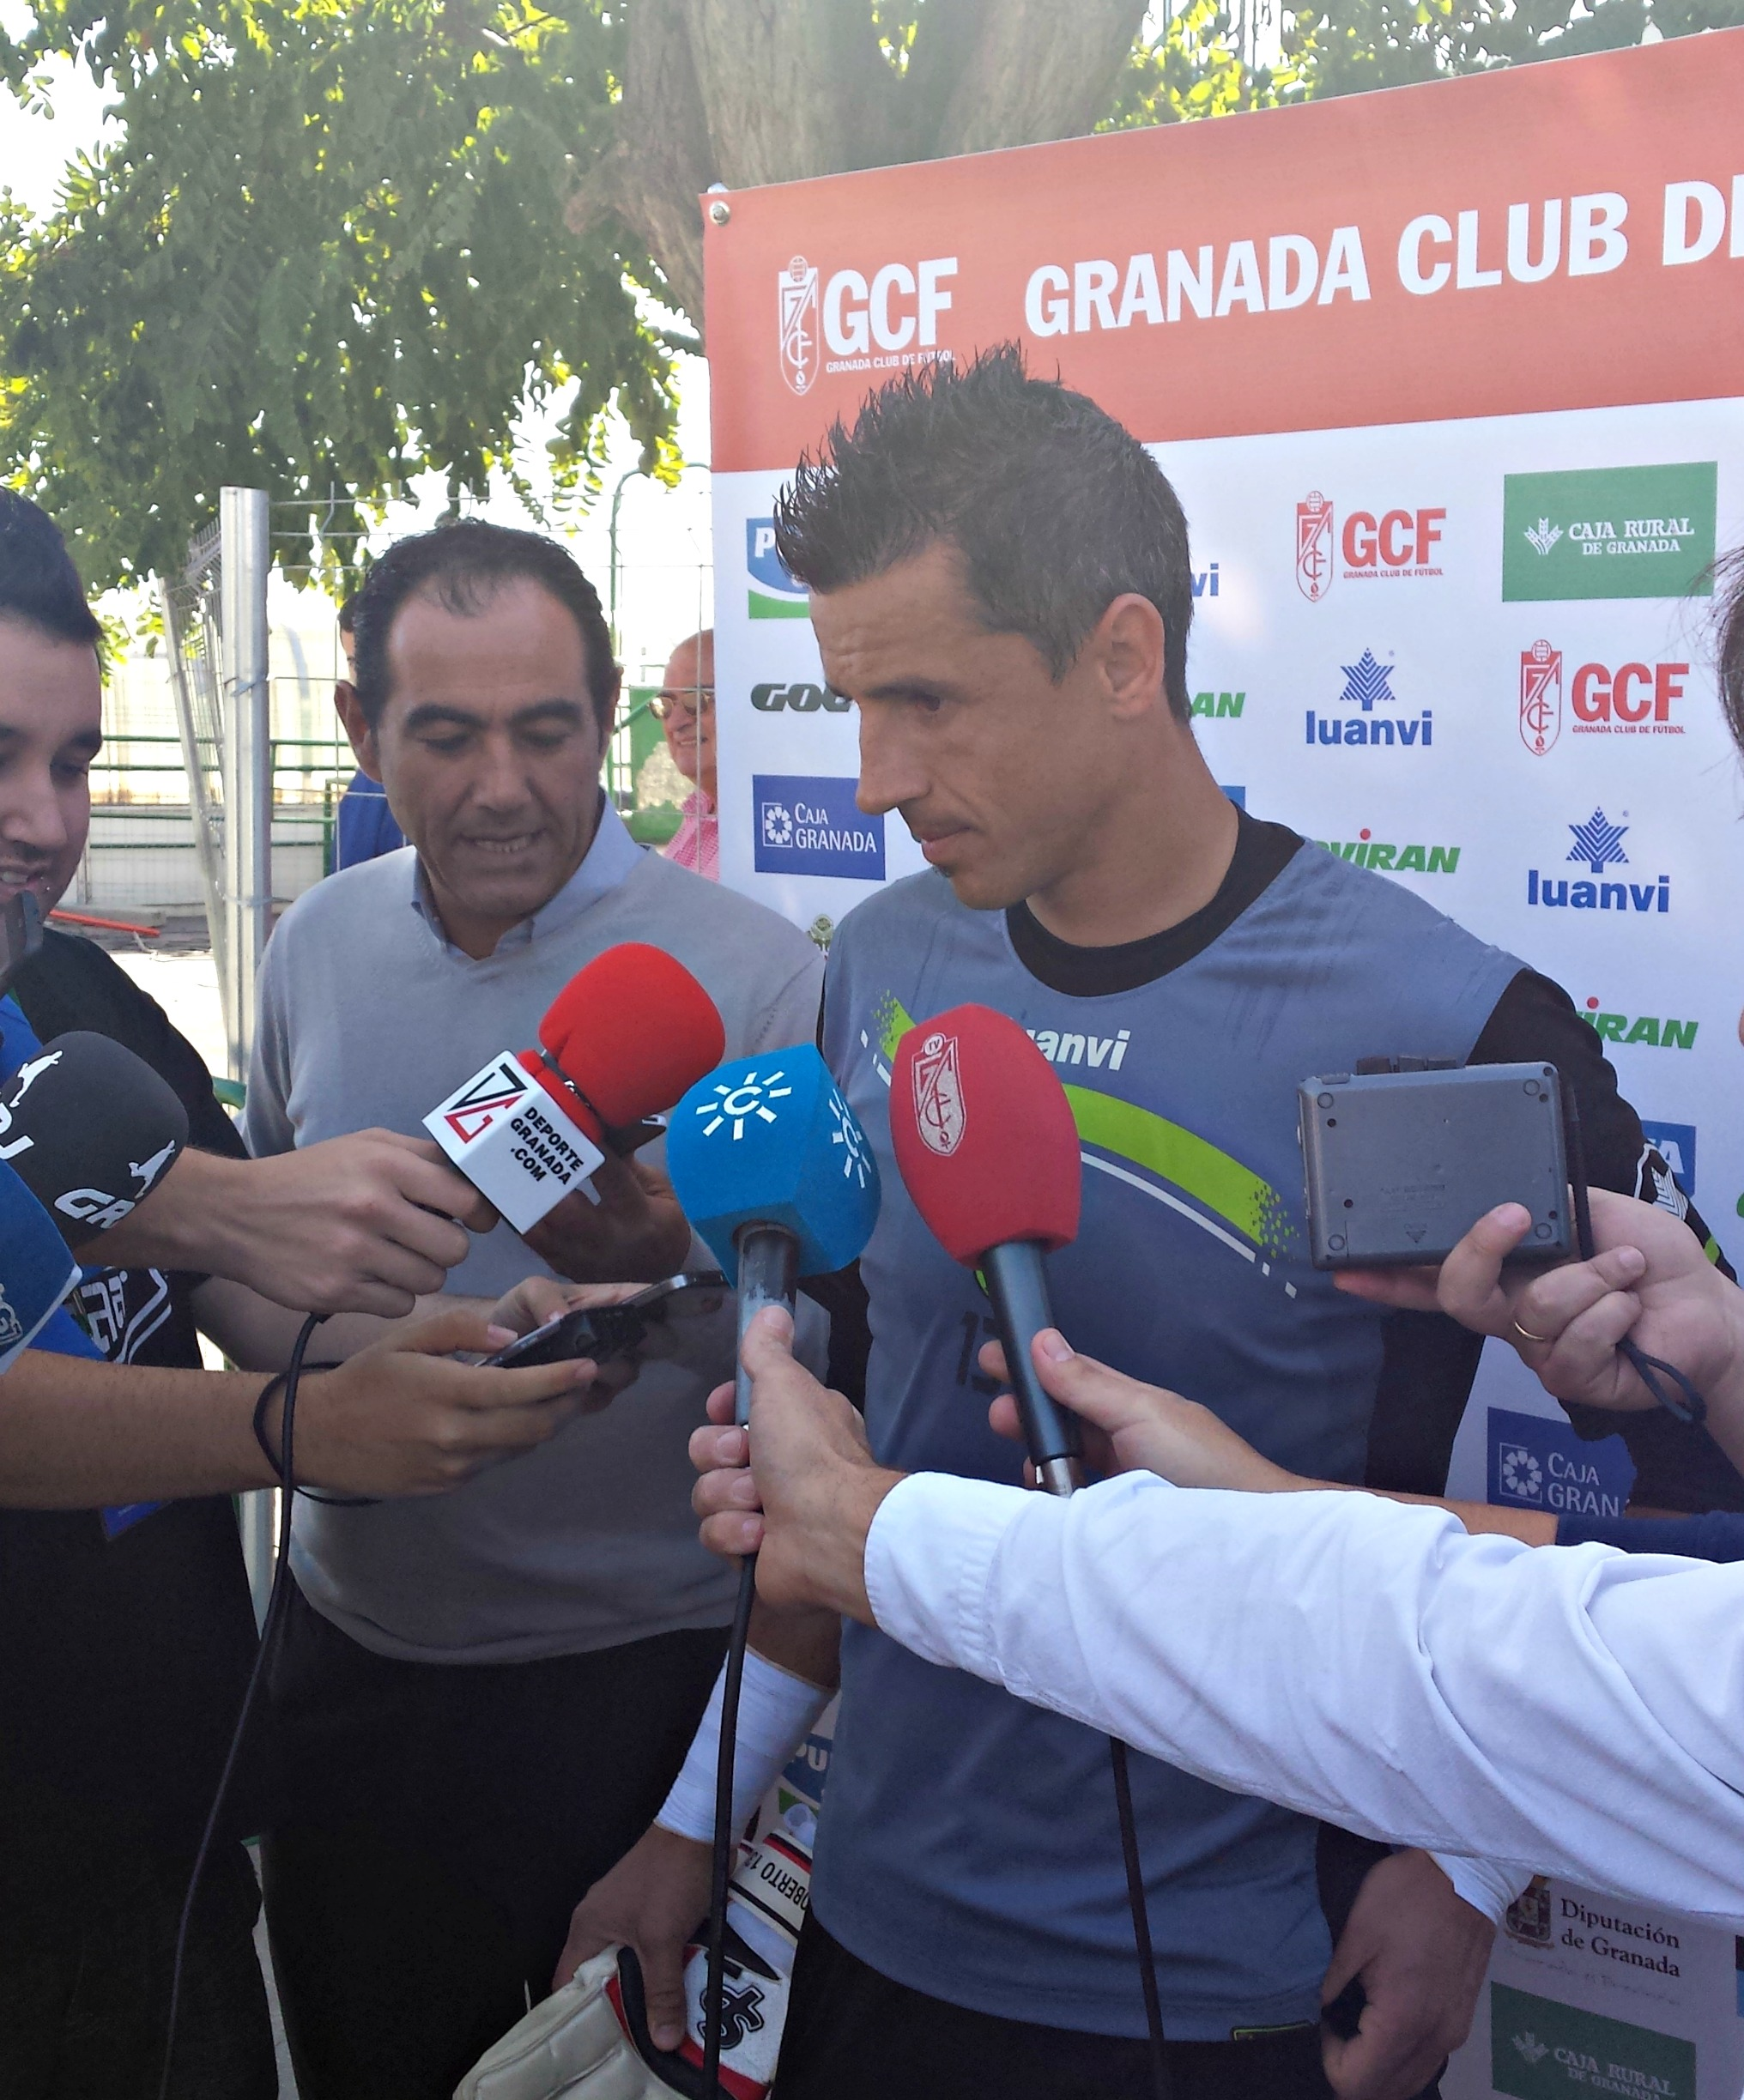 Roberto Granada CF